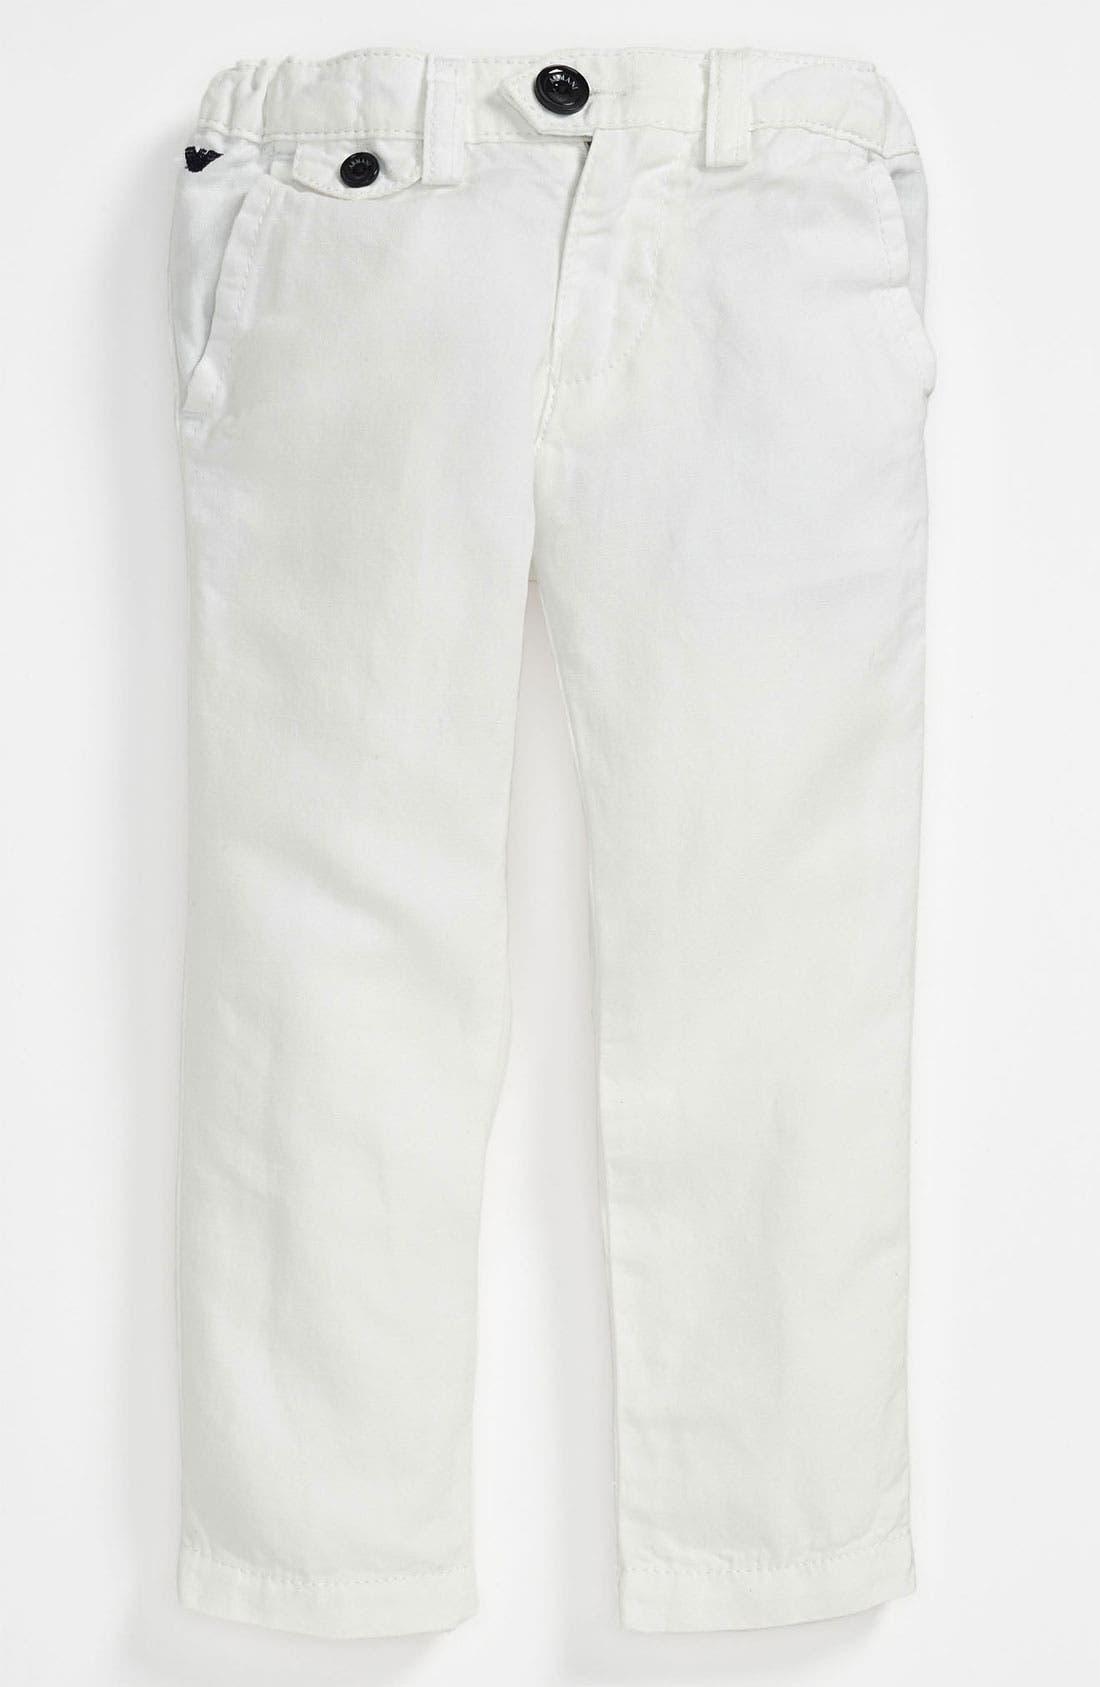 Main Image - Armani Junior Pants (Toddler & Little Boys)